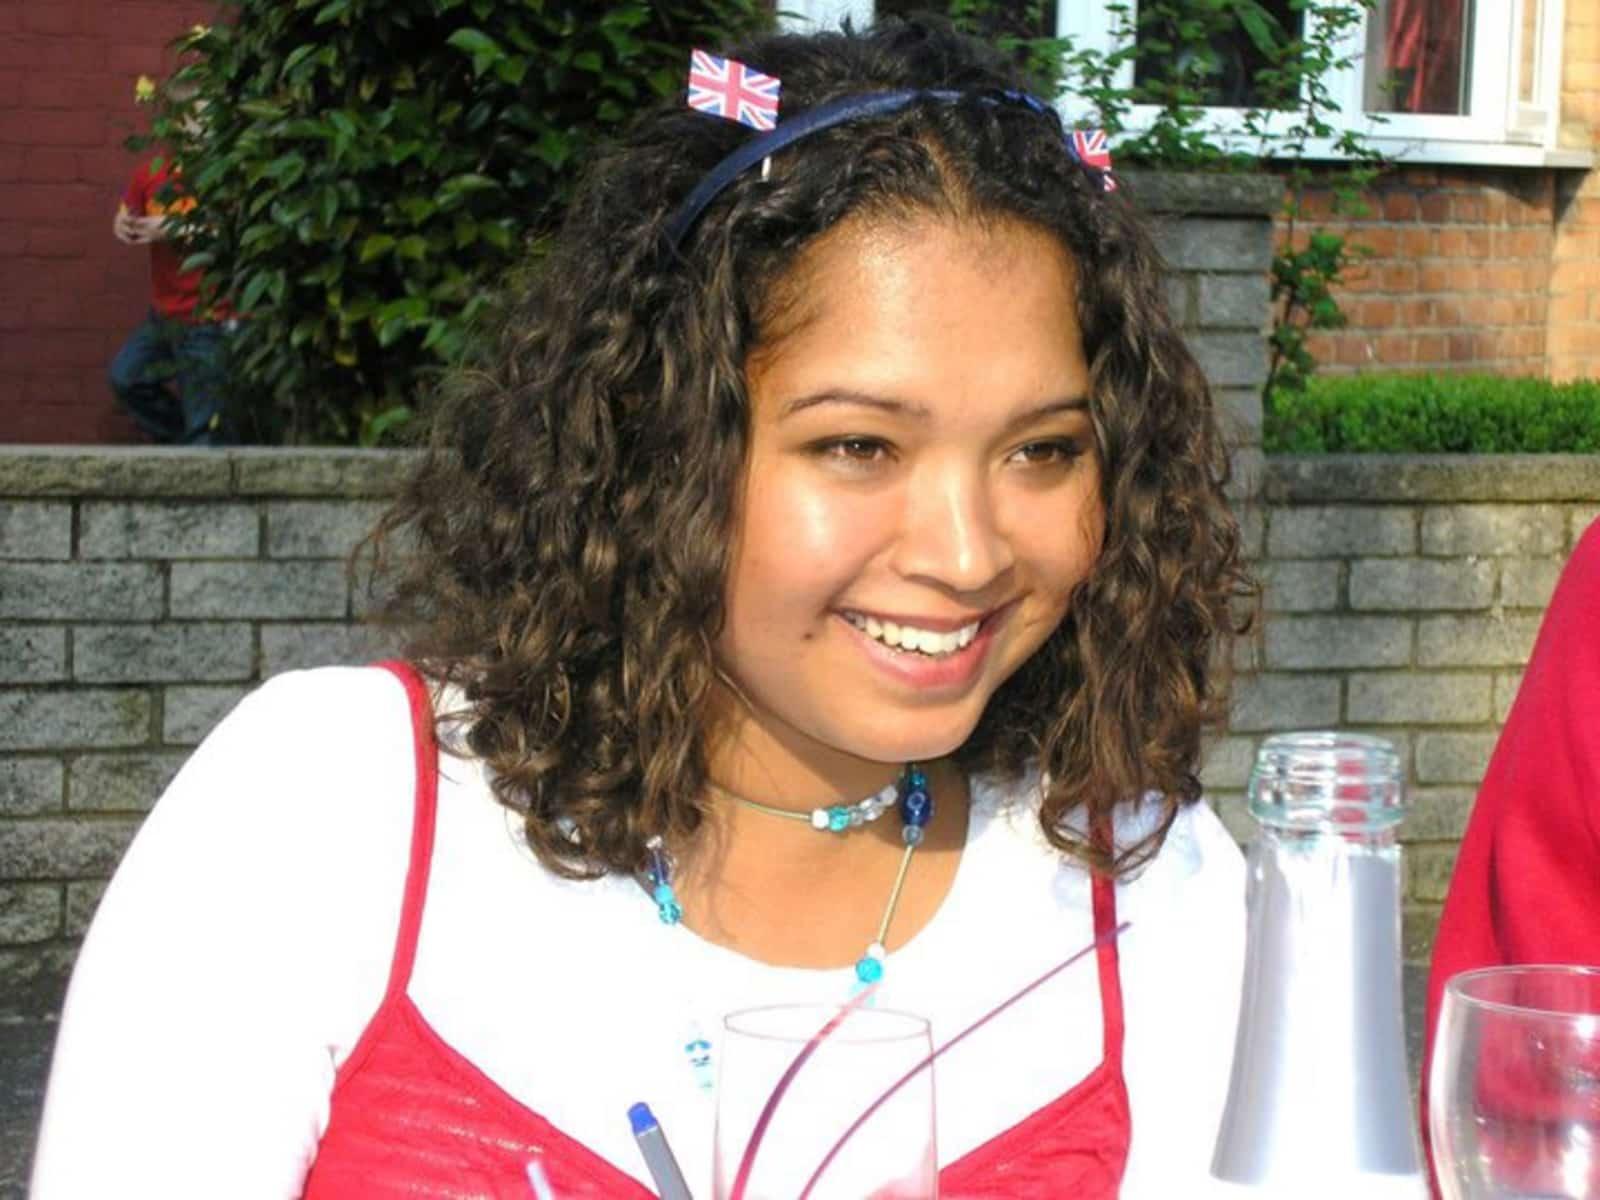 Melissa from London, United Kingdom